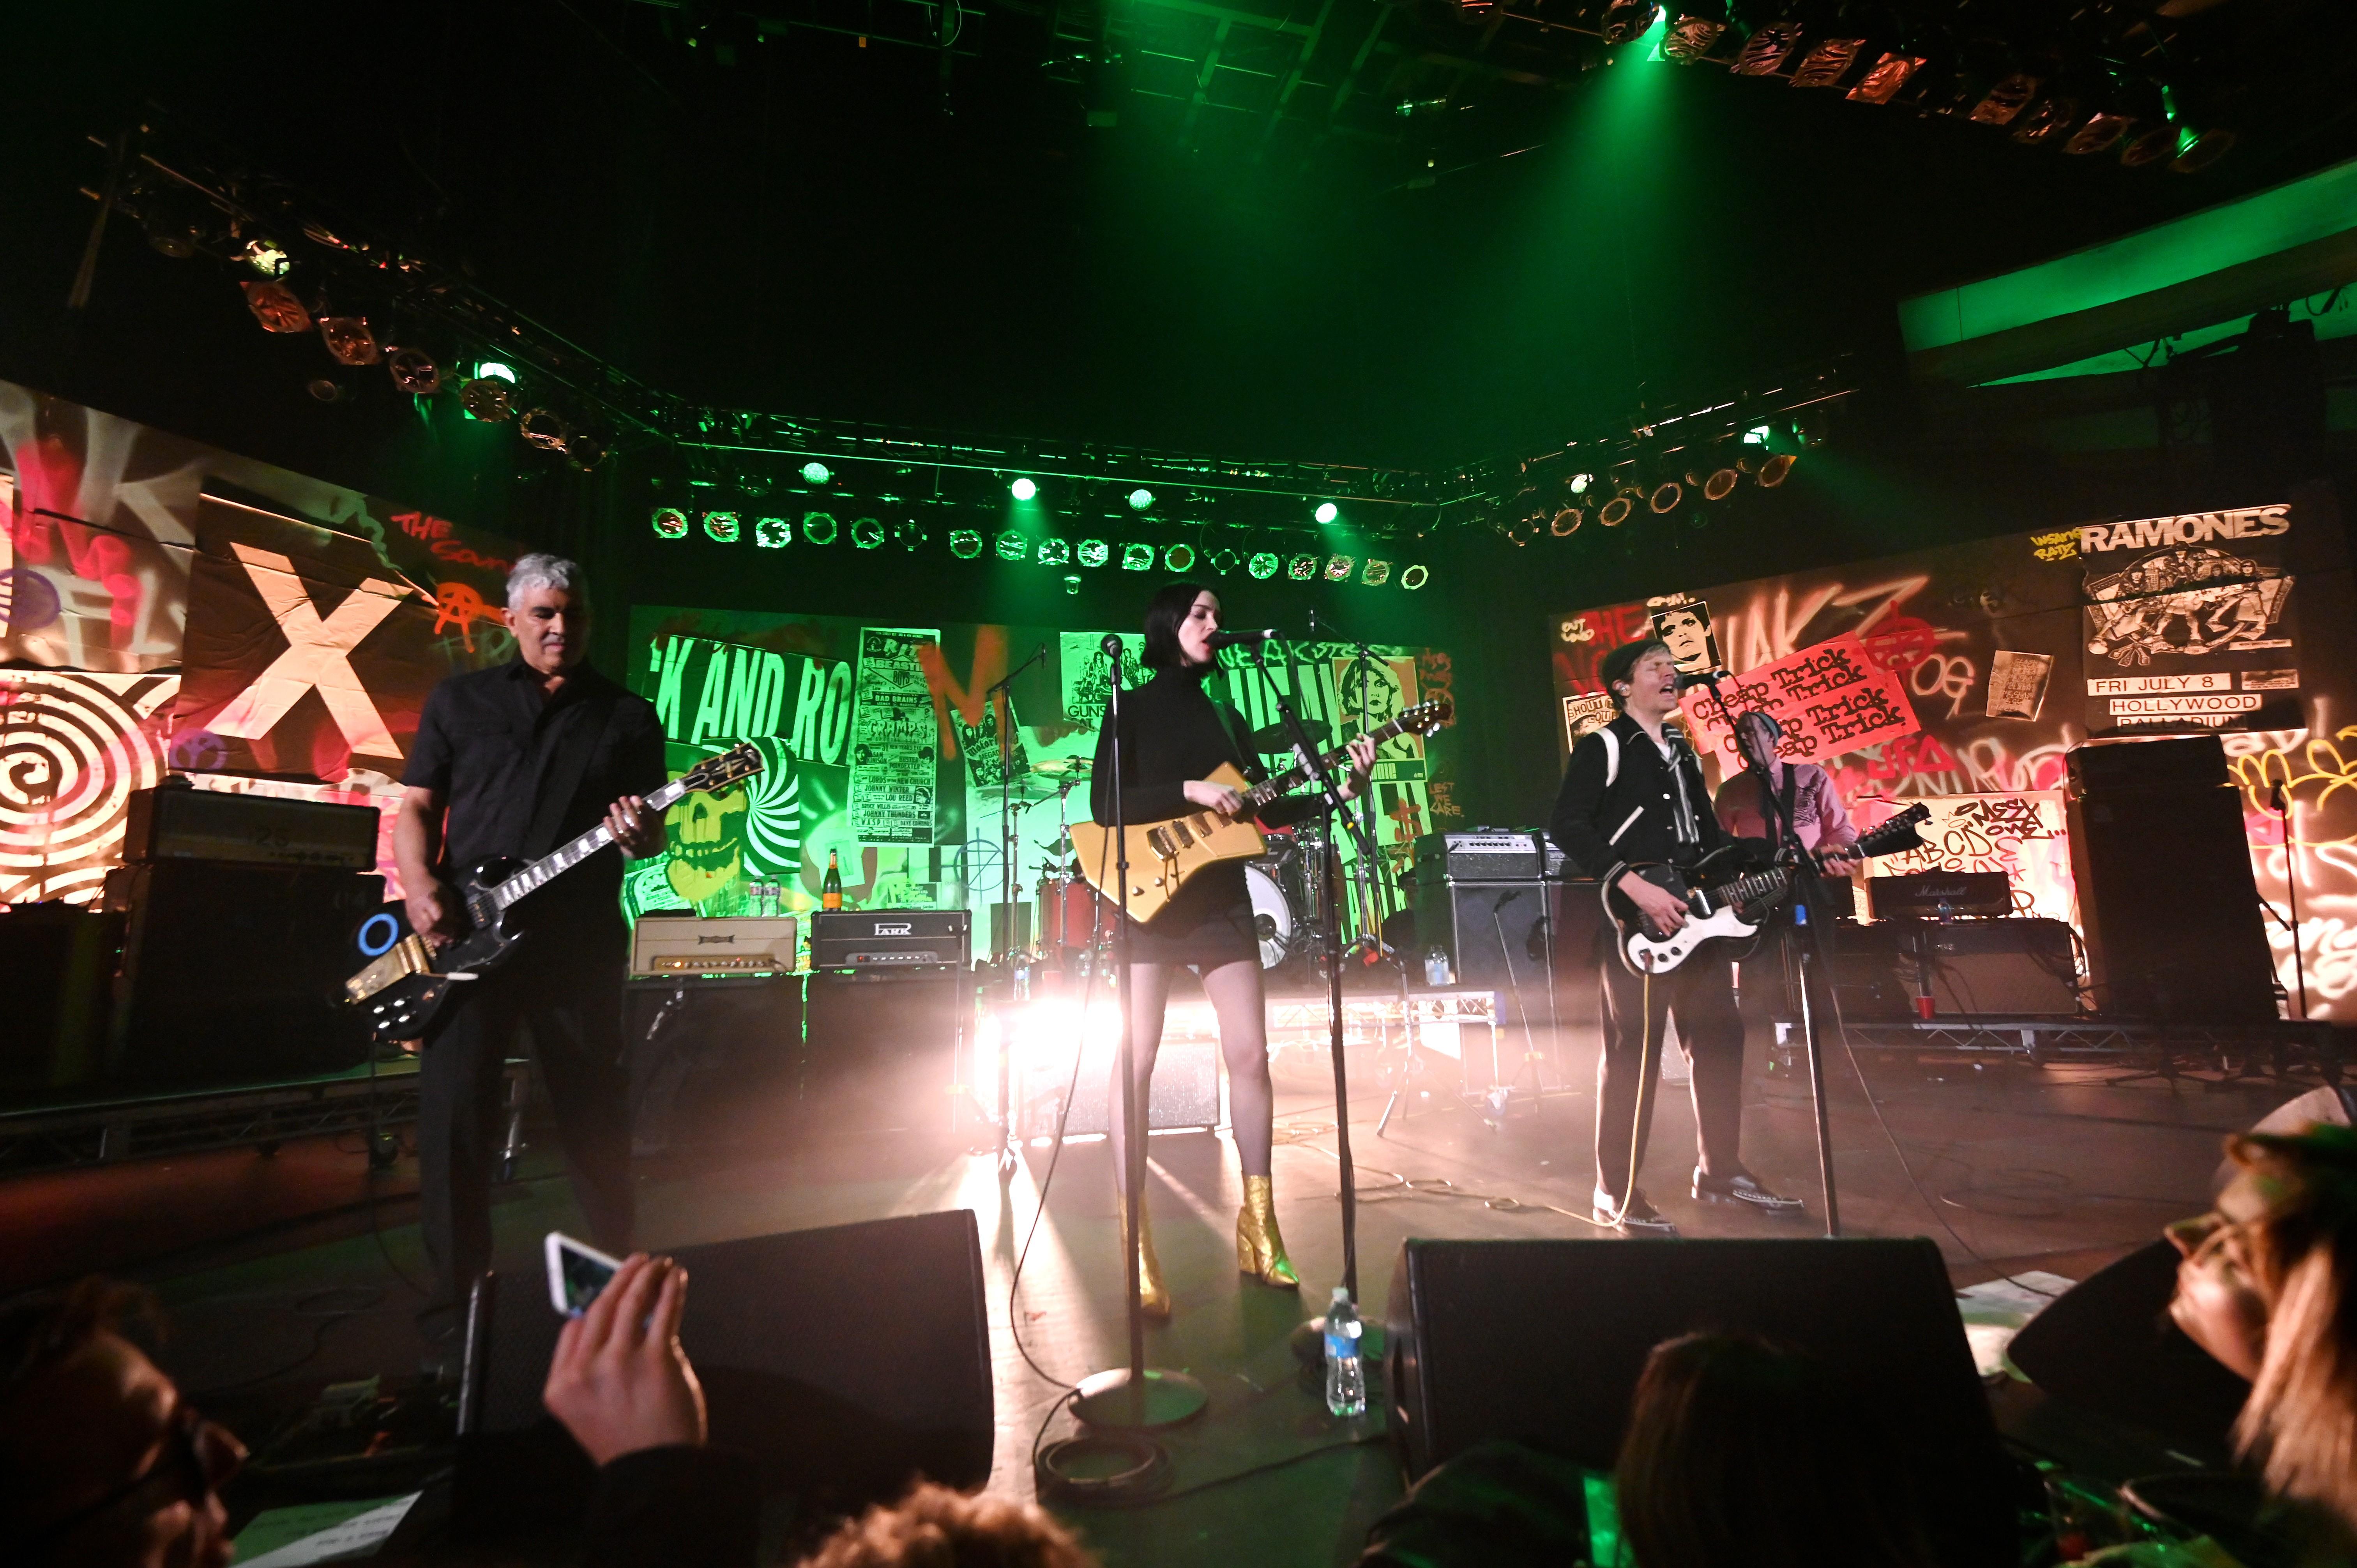 Dave Grohl, Pat Smear, Krist Novoselic, St. Vincent, Beck Nirvana Reunion